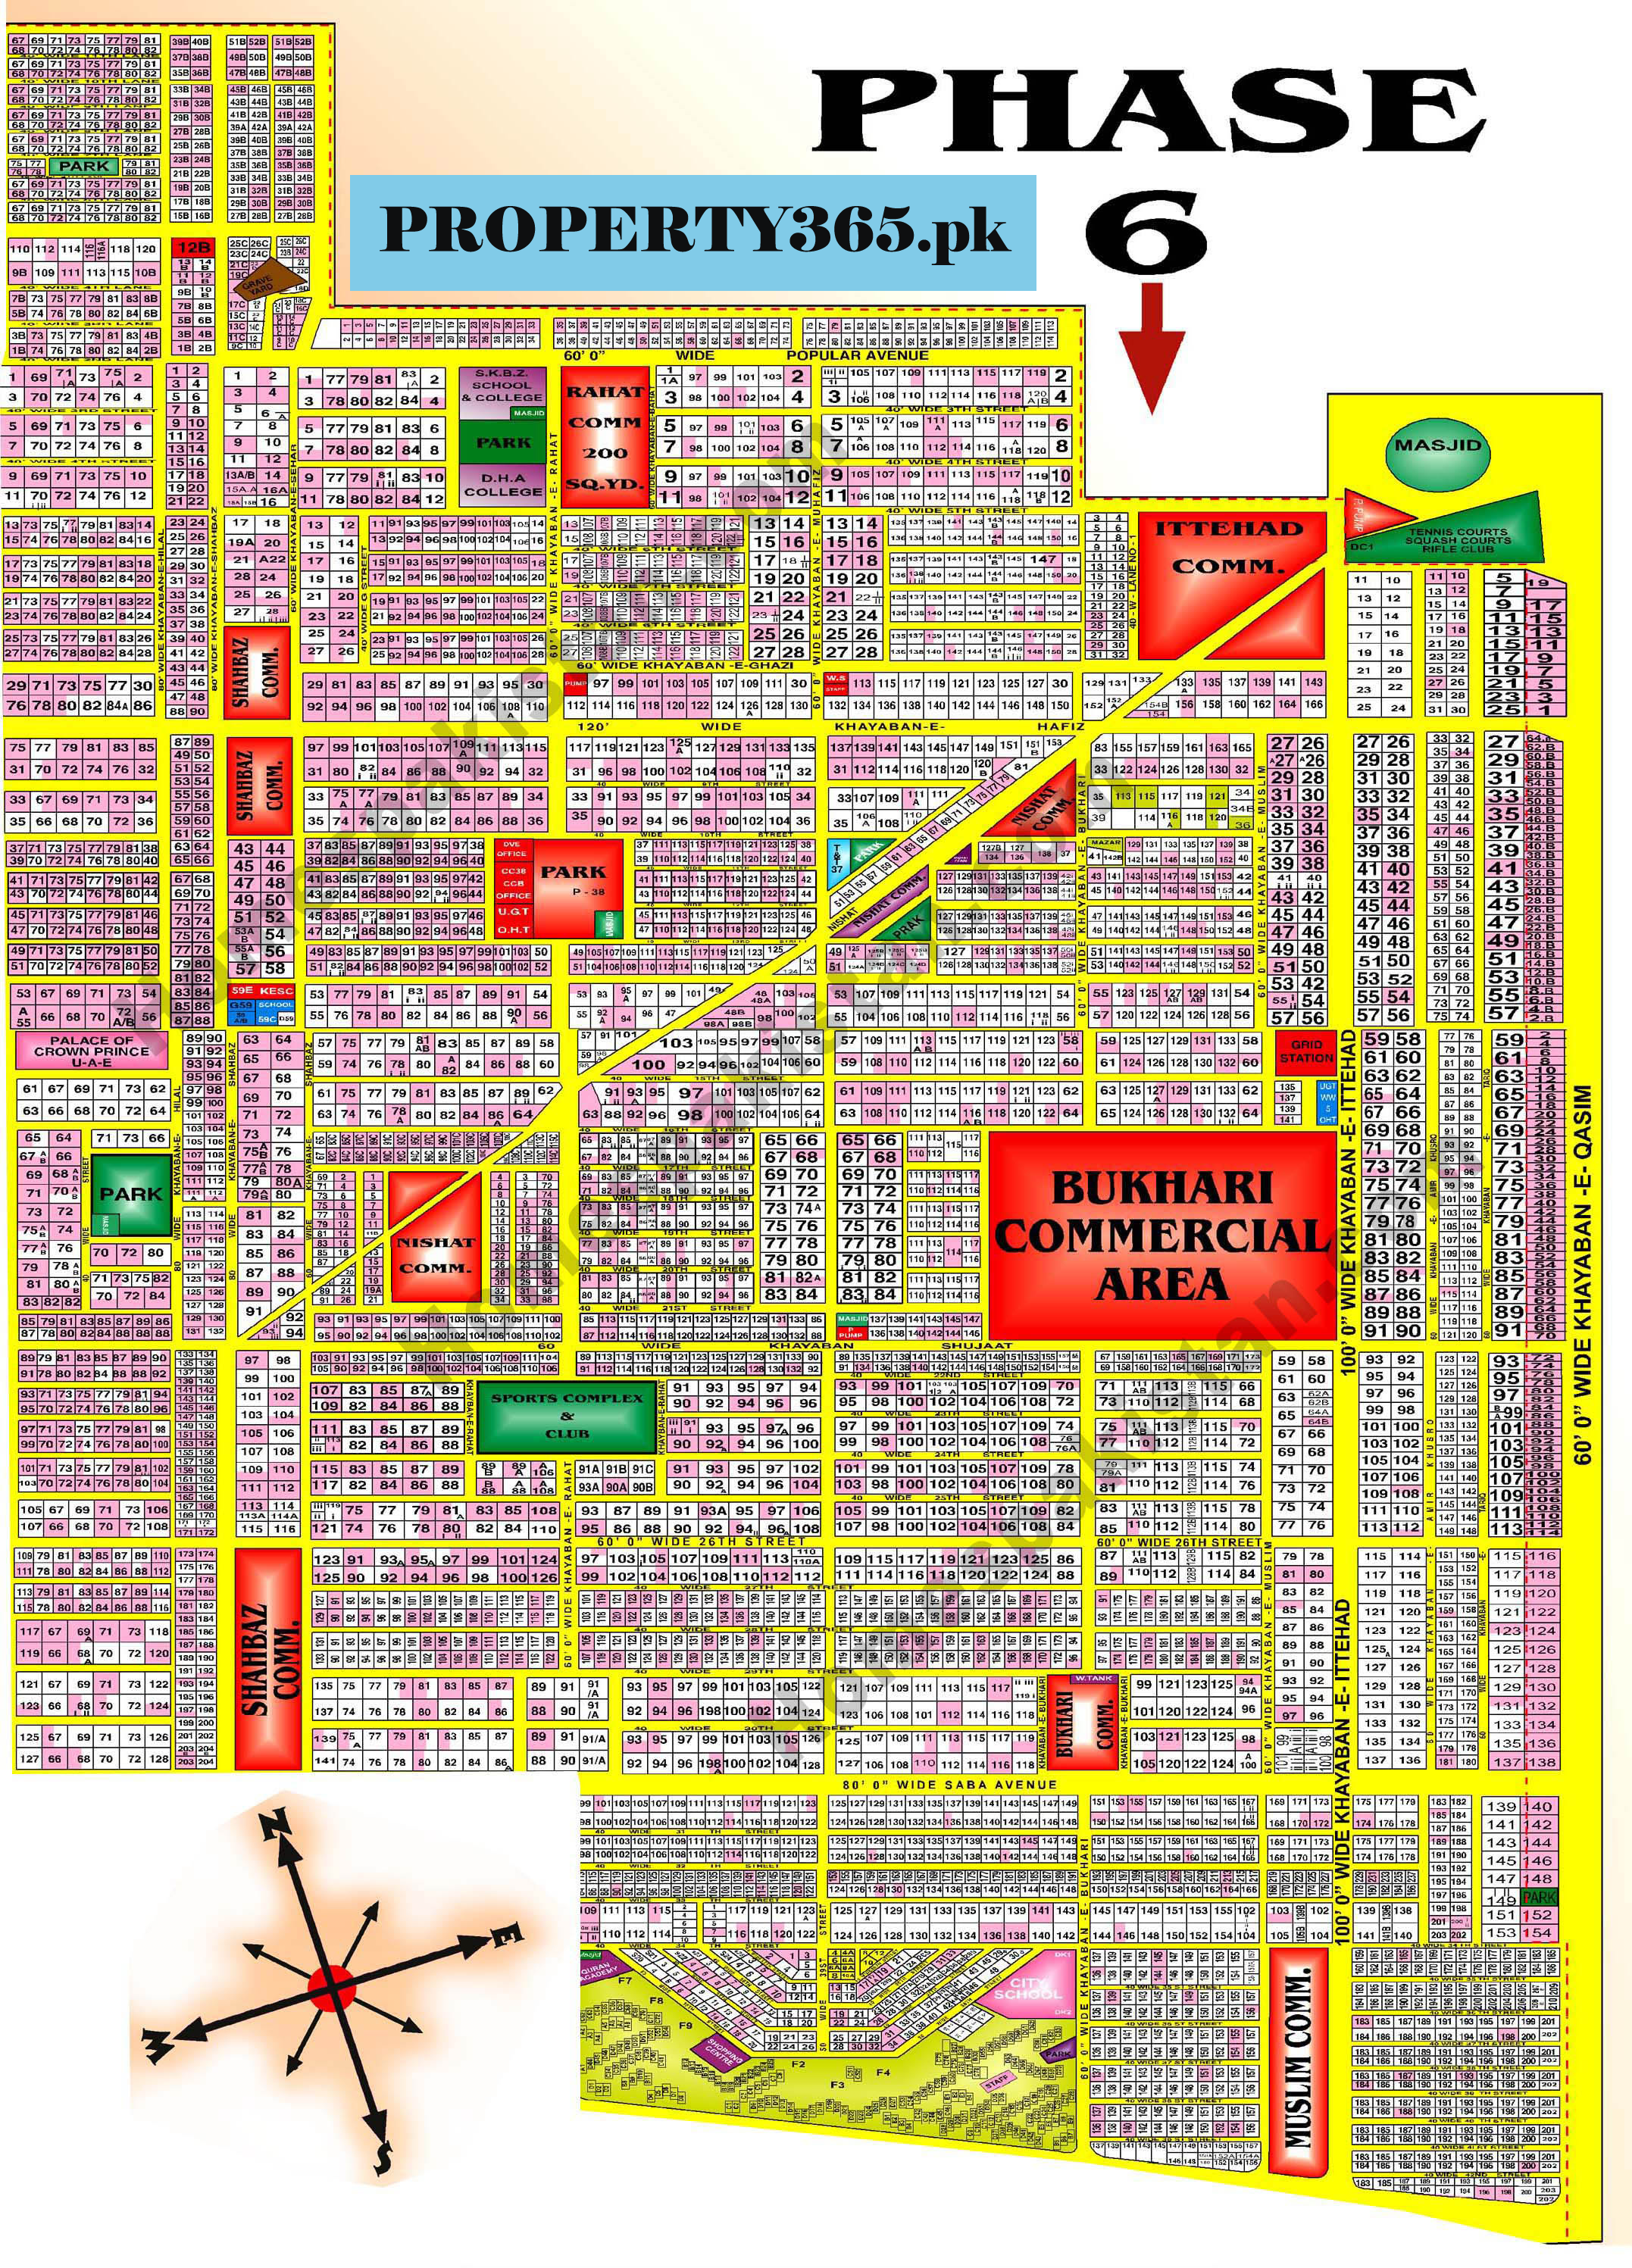 DHA Karachi Phase 6 (Phase VI) Map | Property 365 on kathmandu map, baghdad map, madras map, riyadh map, pakistan map, hong kong map, baluchistan map, kabul map, dakar map, mumbai map, lahore map, town map, dhaka map, hyderabad map, indus river map, khyber pass map, kolkata map, kuala lumpur map, islamabad map, abadan map,